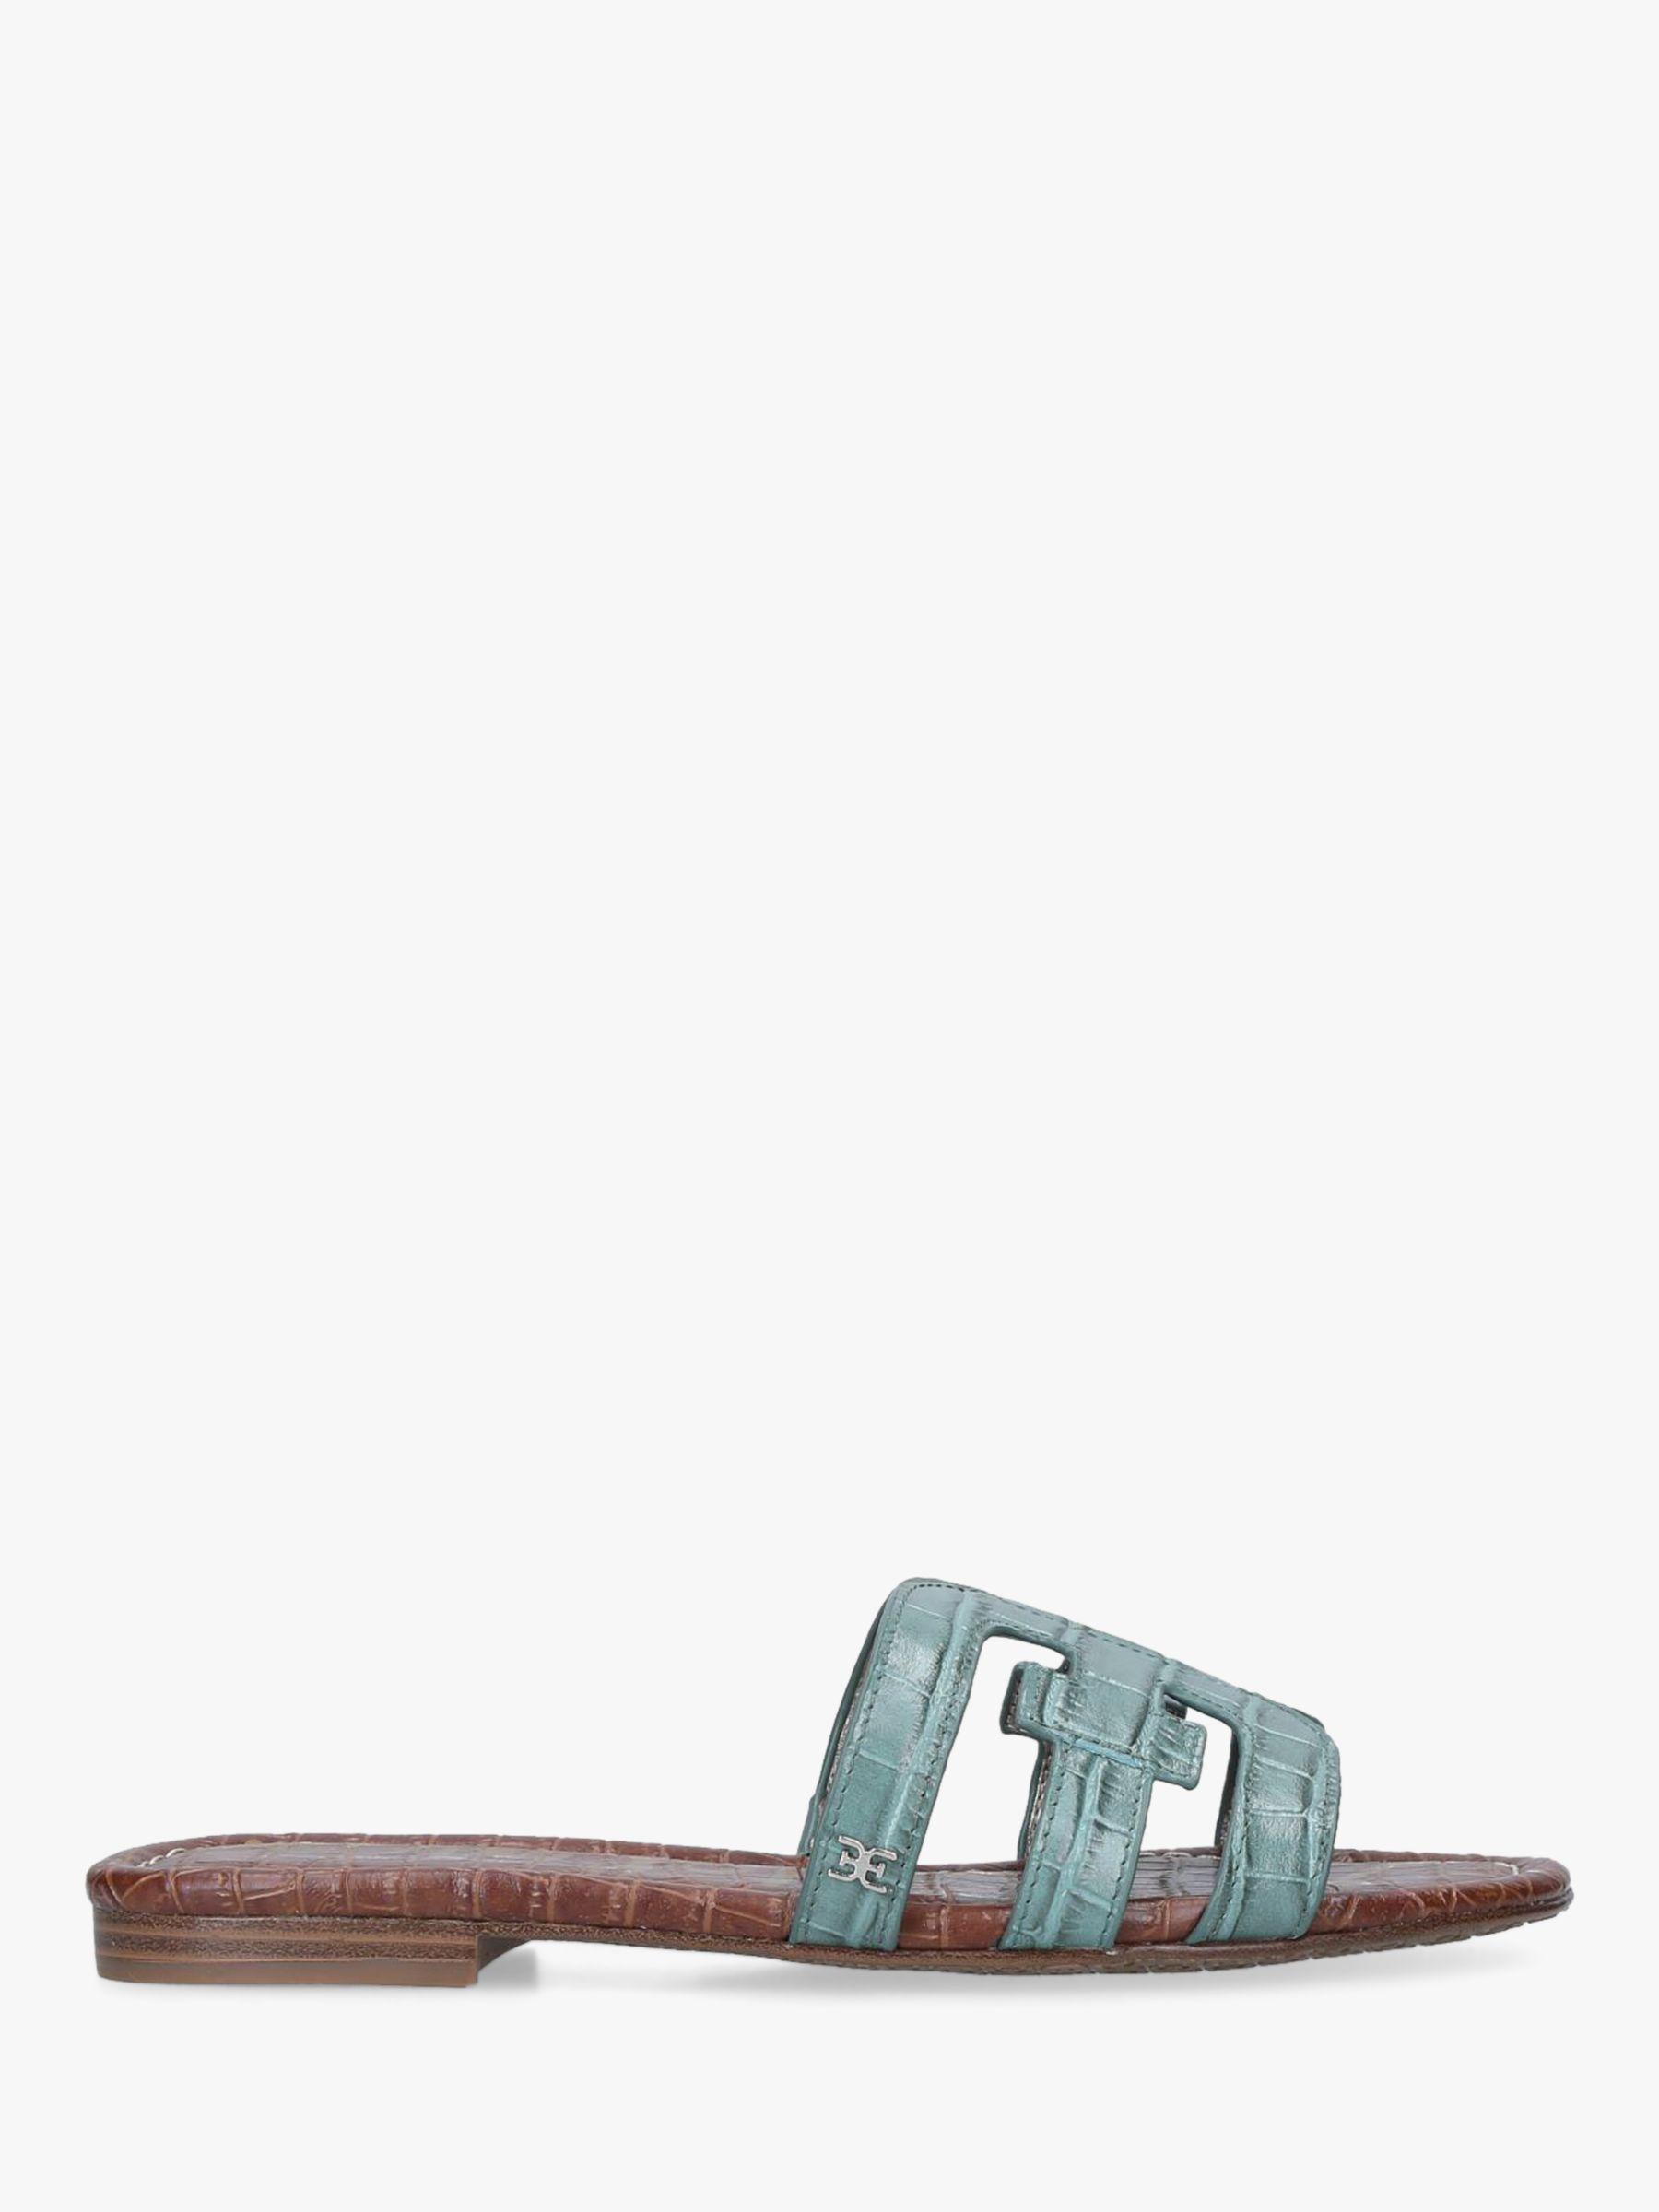 Sam Edelman Sam Edelman Bay Leather Slider Sandals